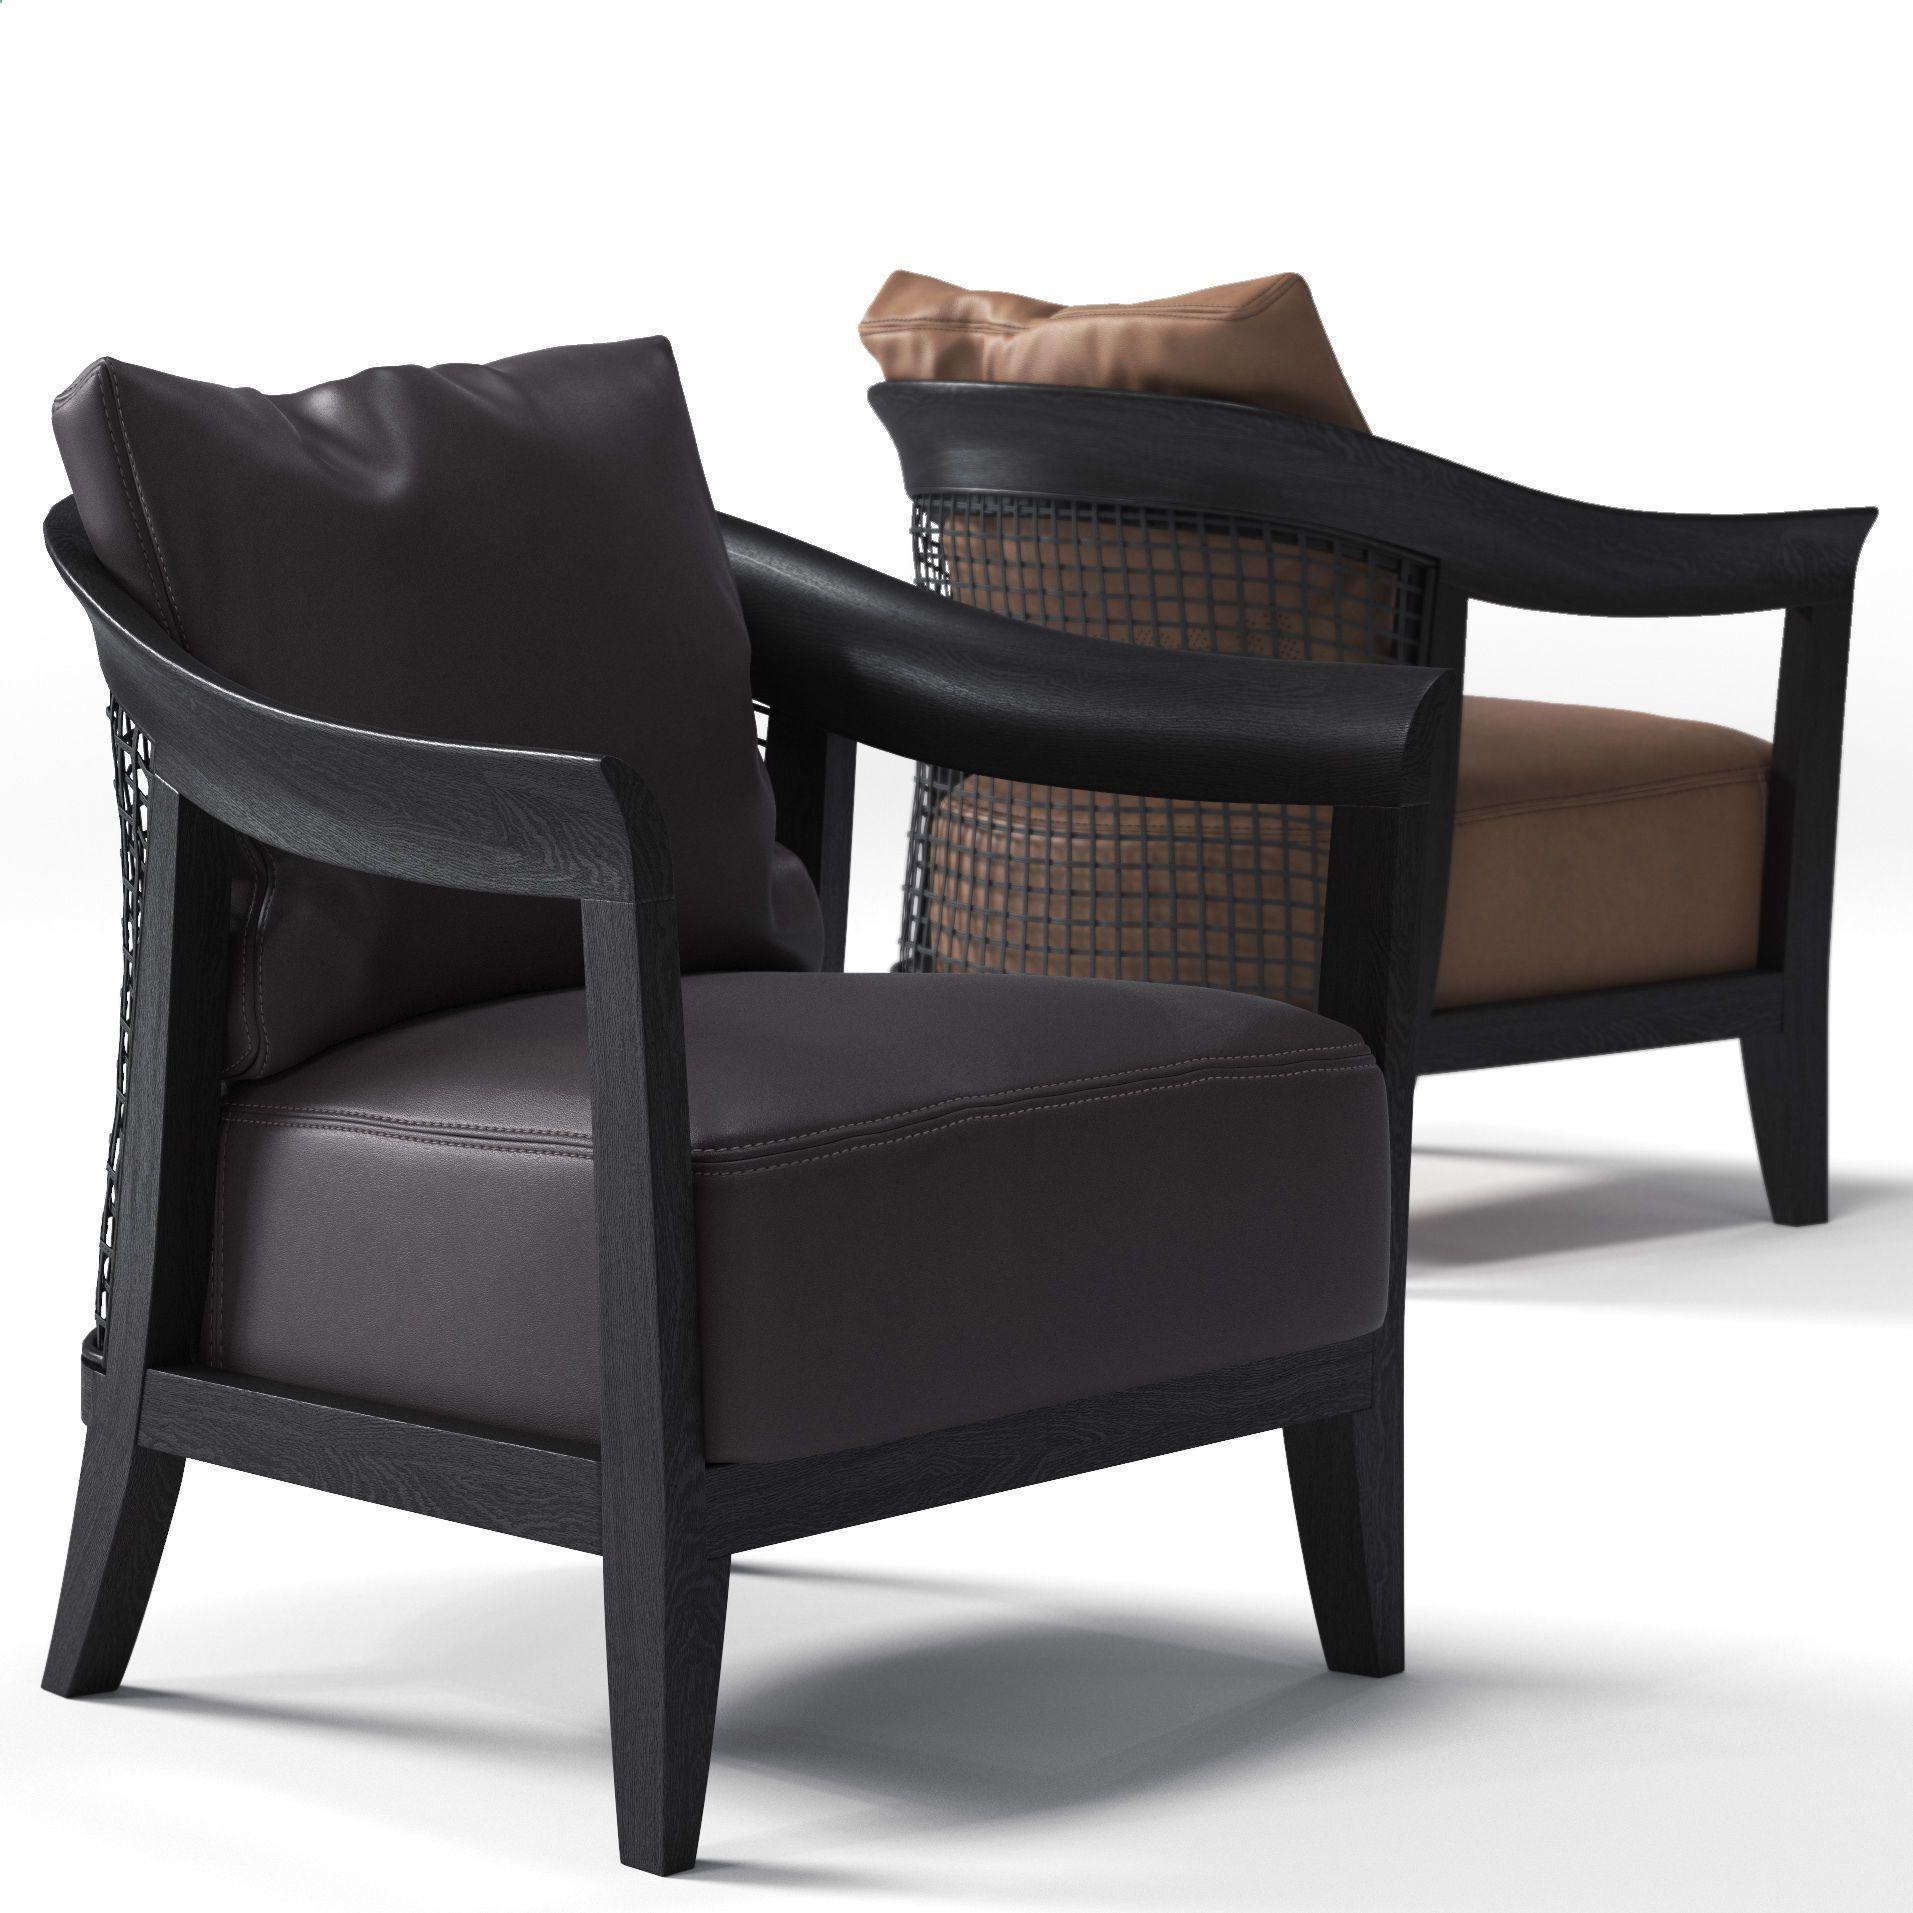 bedroom furniture chairs cupboards design design plans dressers rh pinterest com